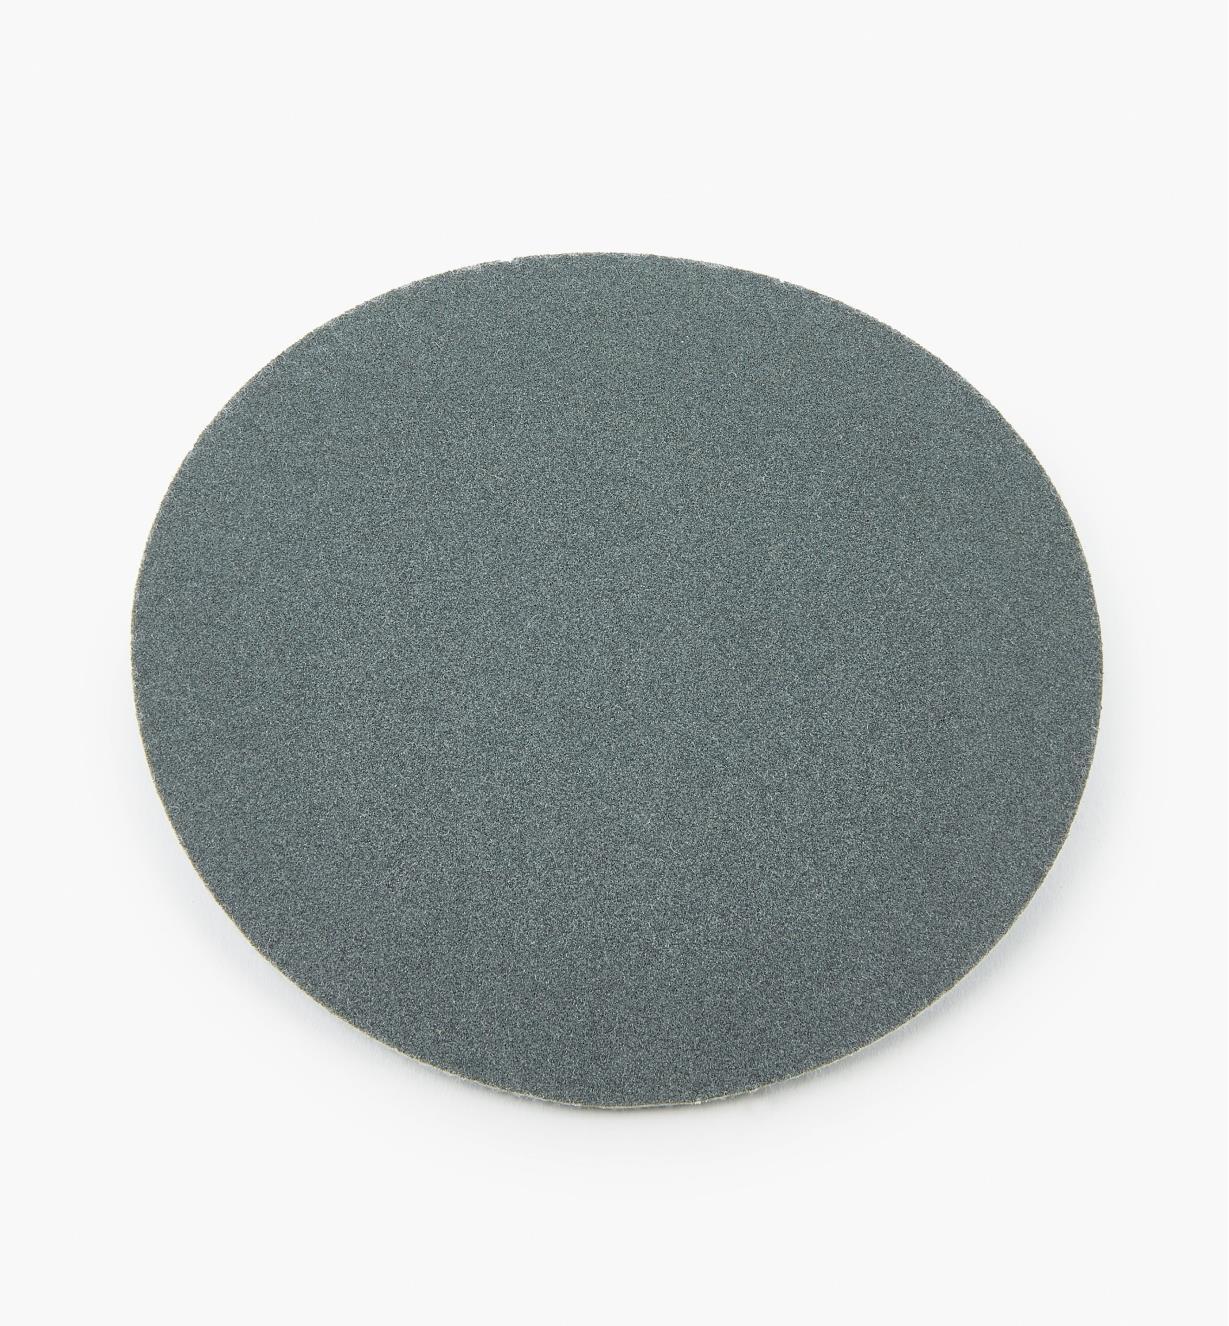 54K9031 - 1800x Micro-Mesh Disc, ea.